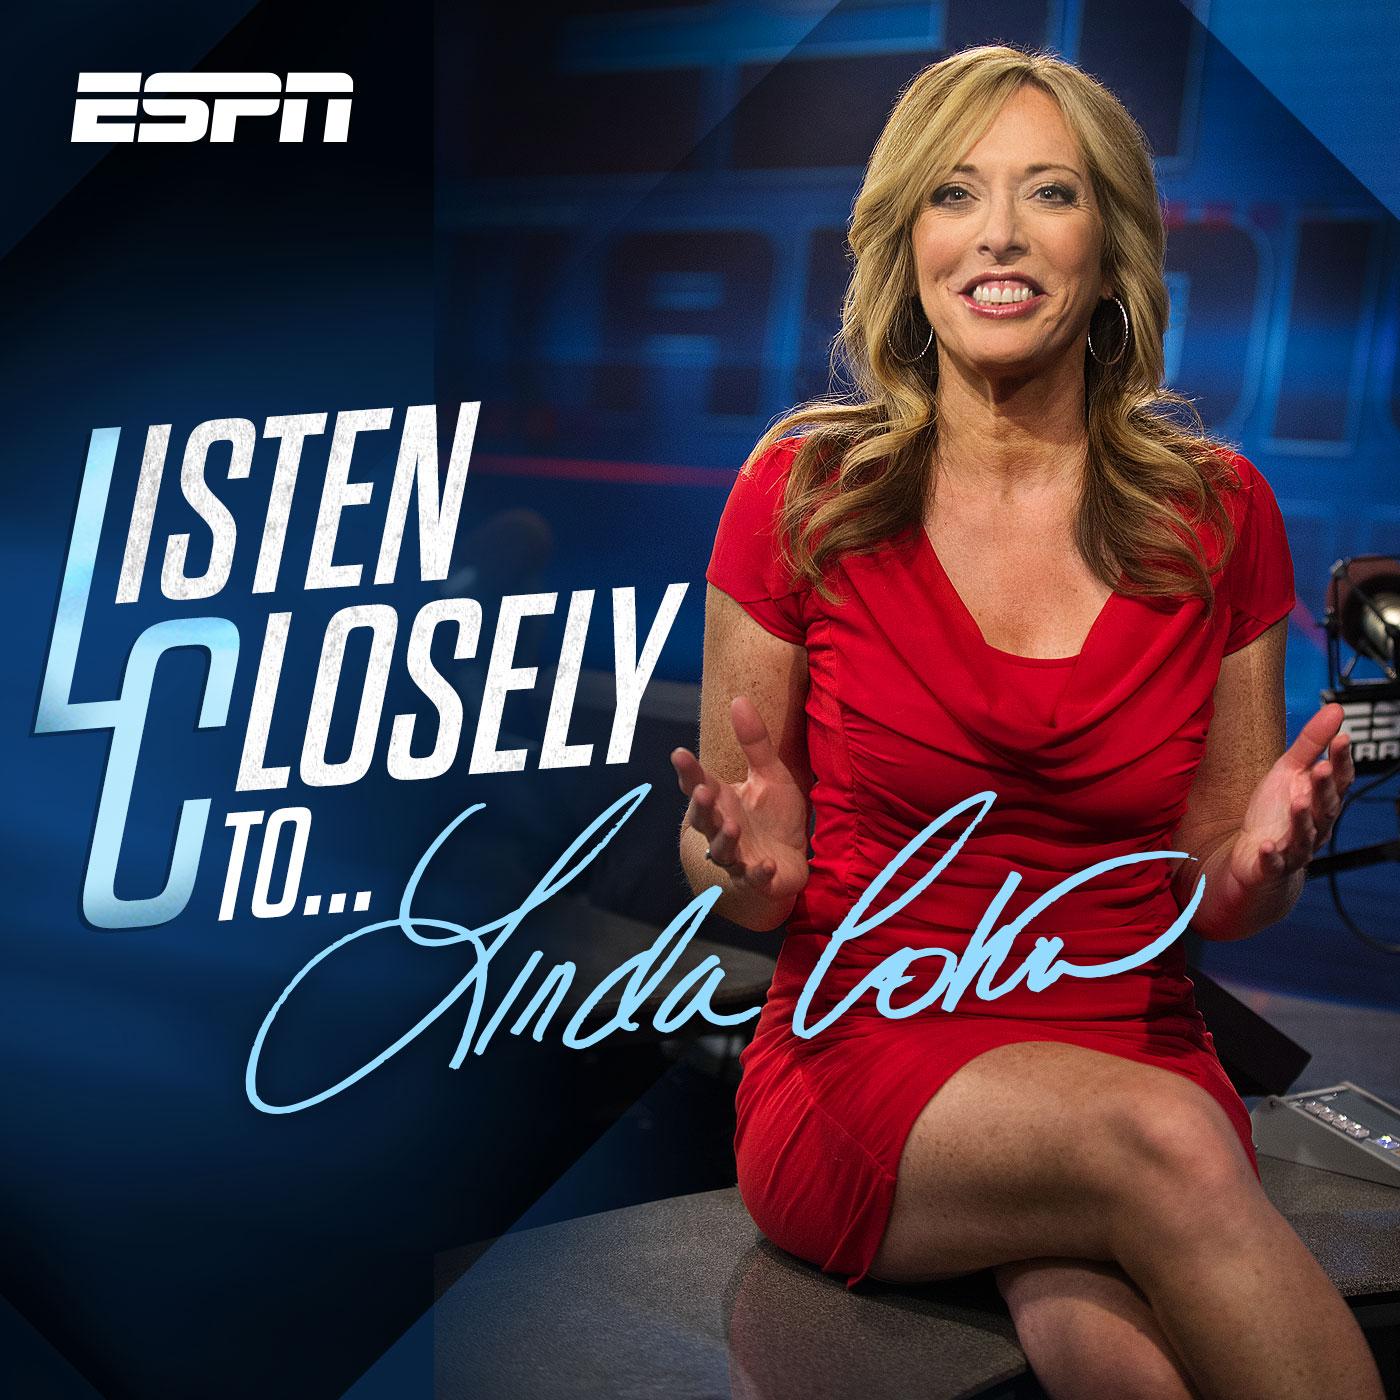 ESPN: Listen Closely to Linda Cohn